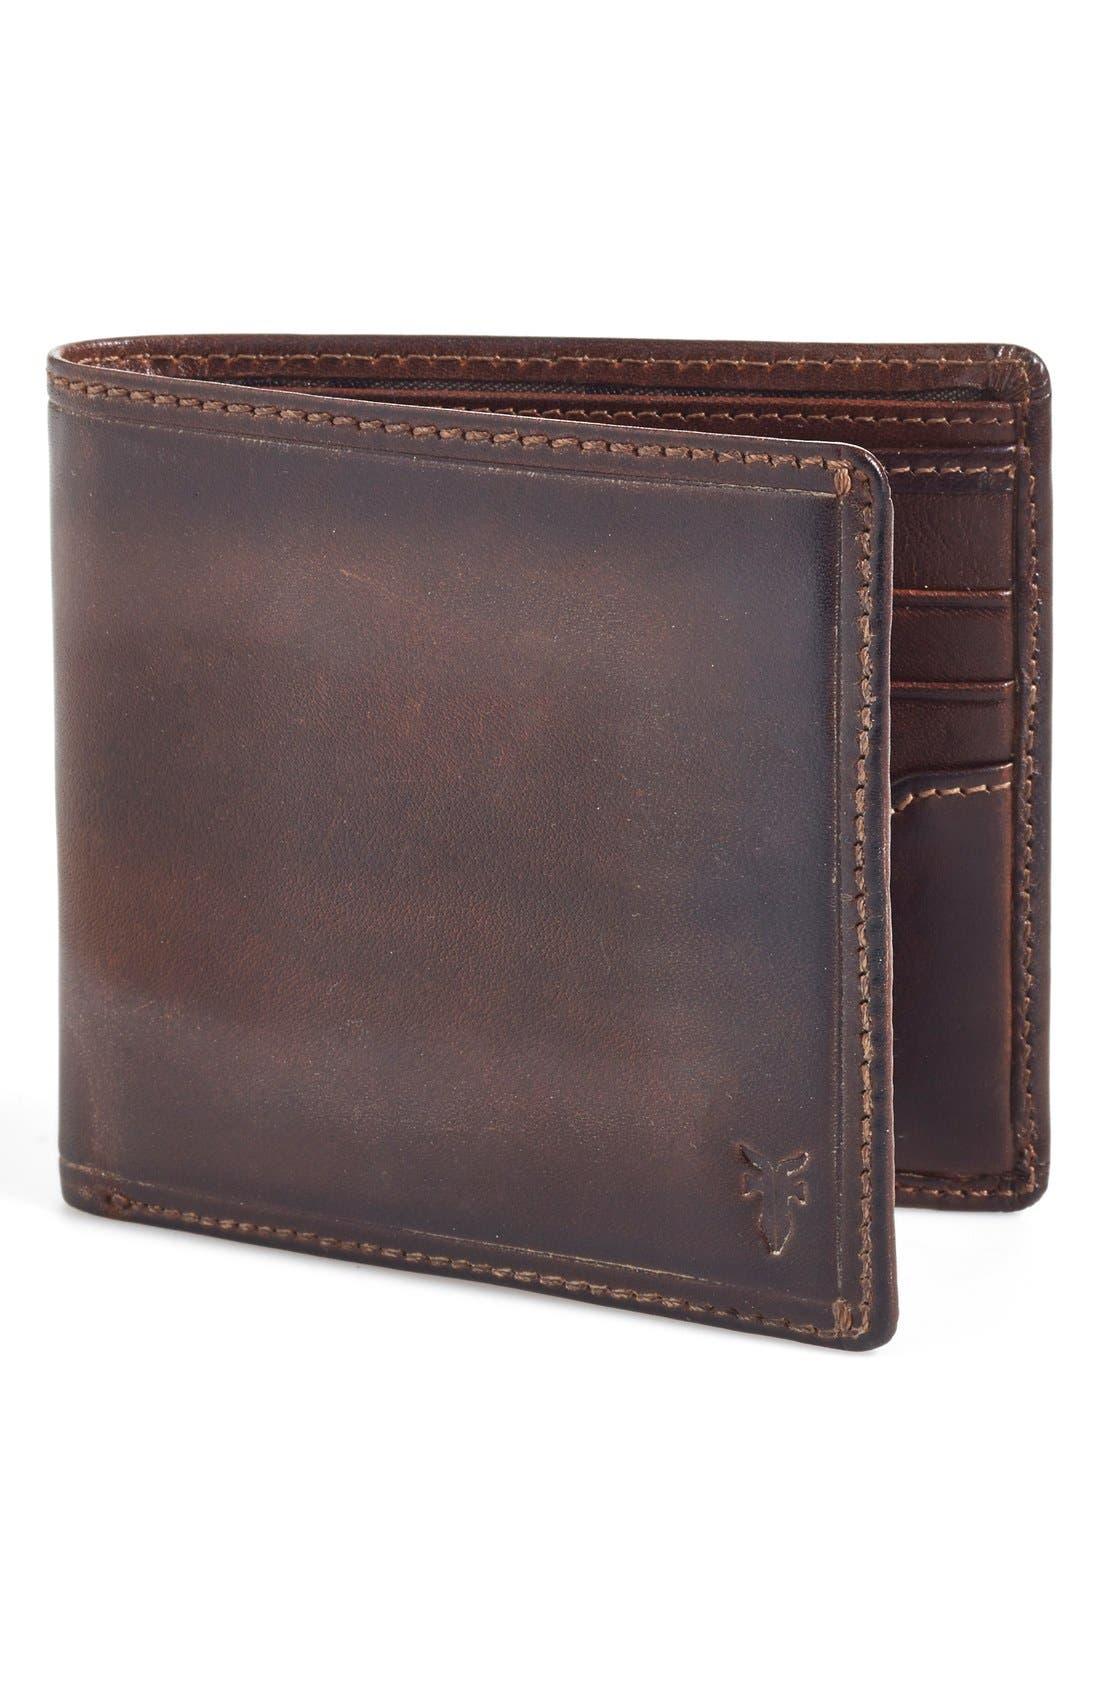 Alternate Image 1 Selected - Frye 'Logan' Leather Billfold Wallet (Online Only)